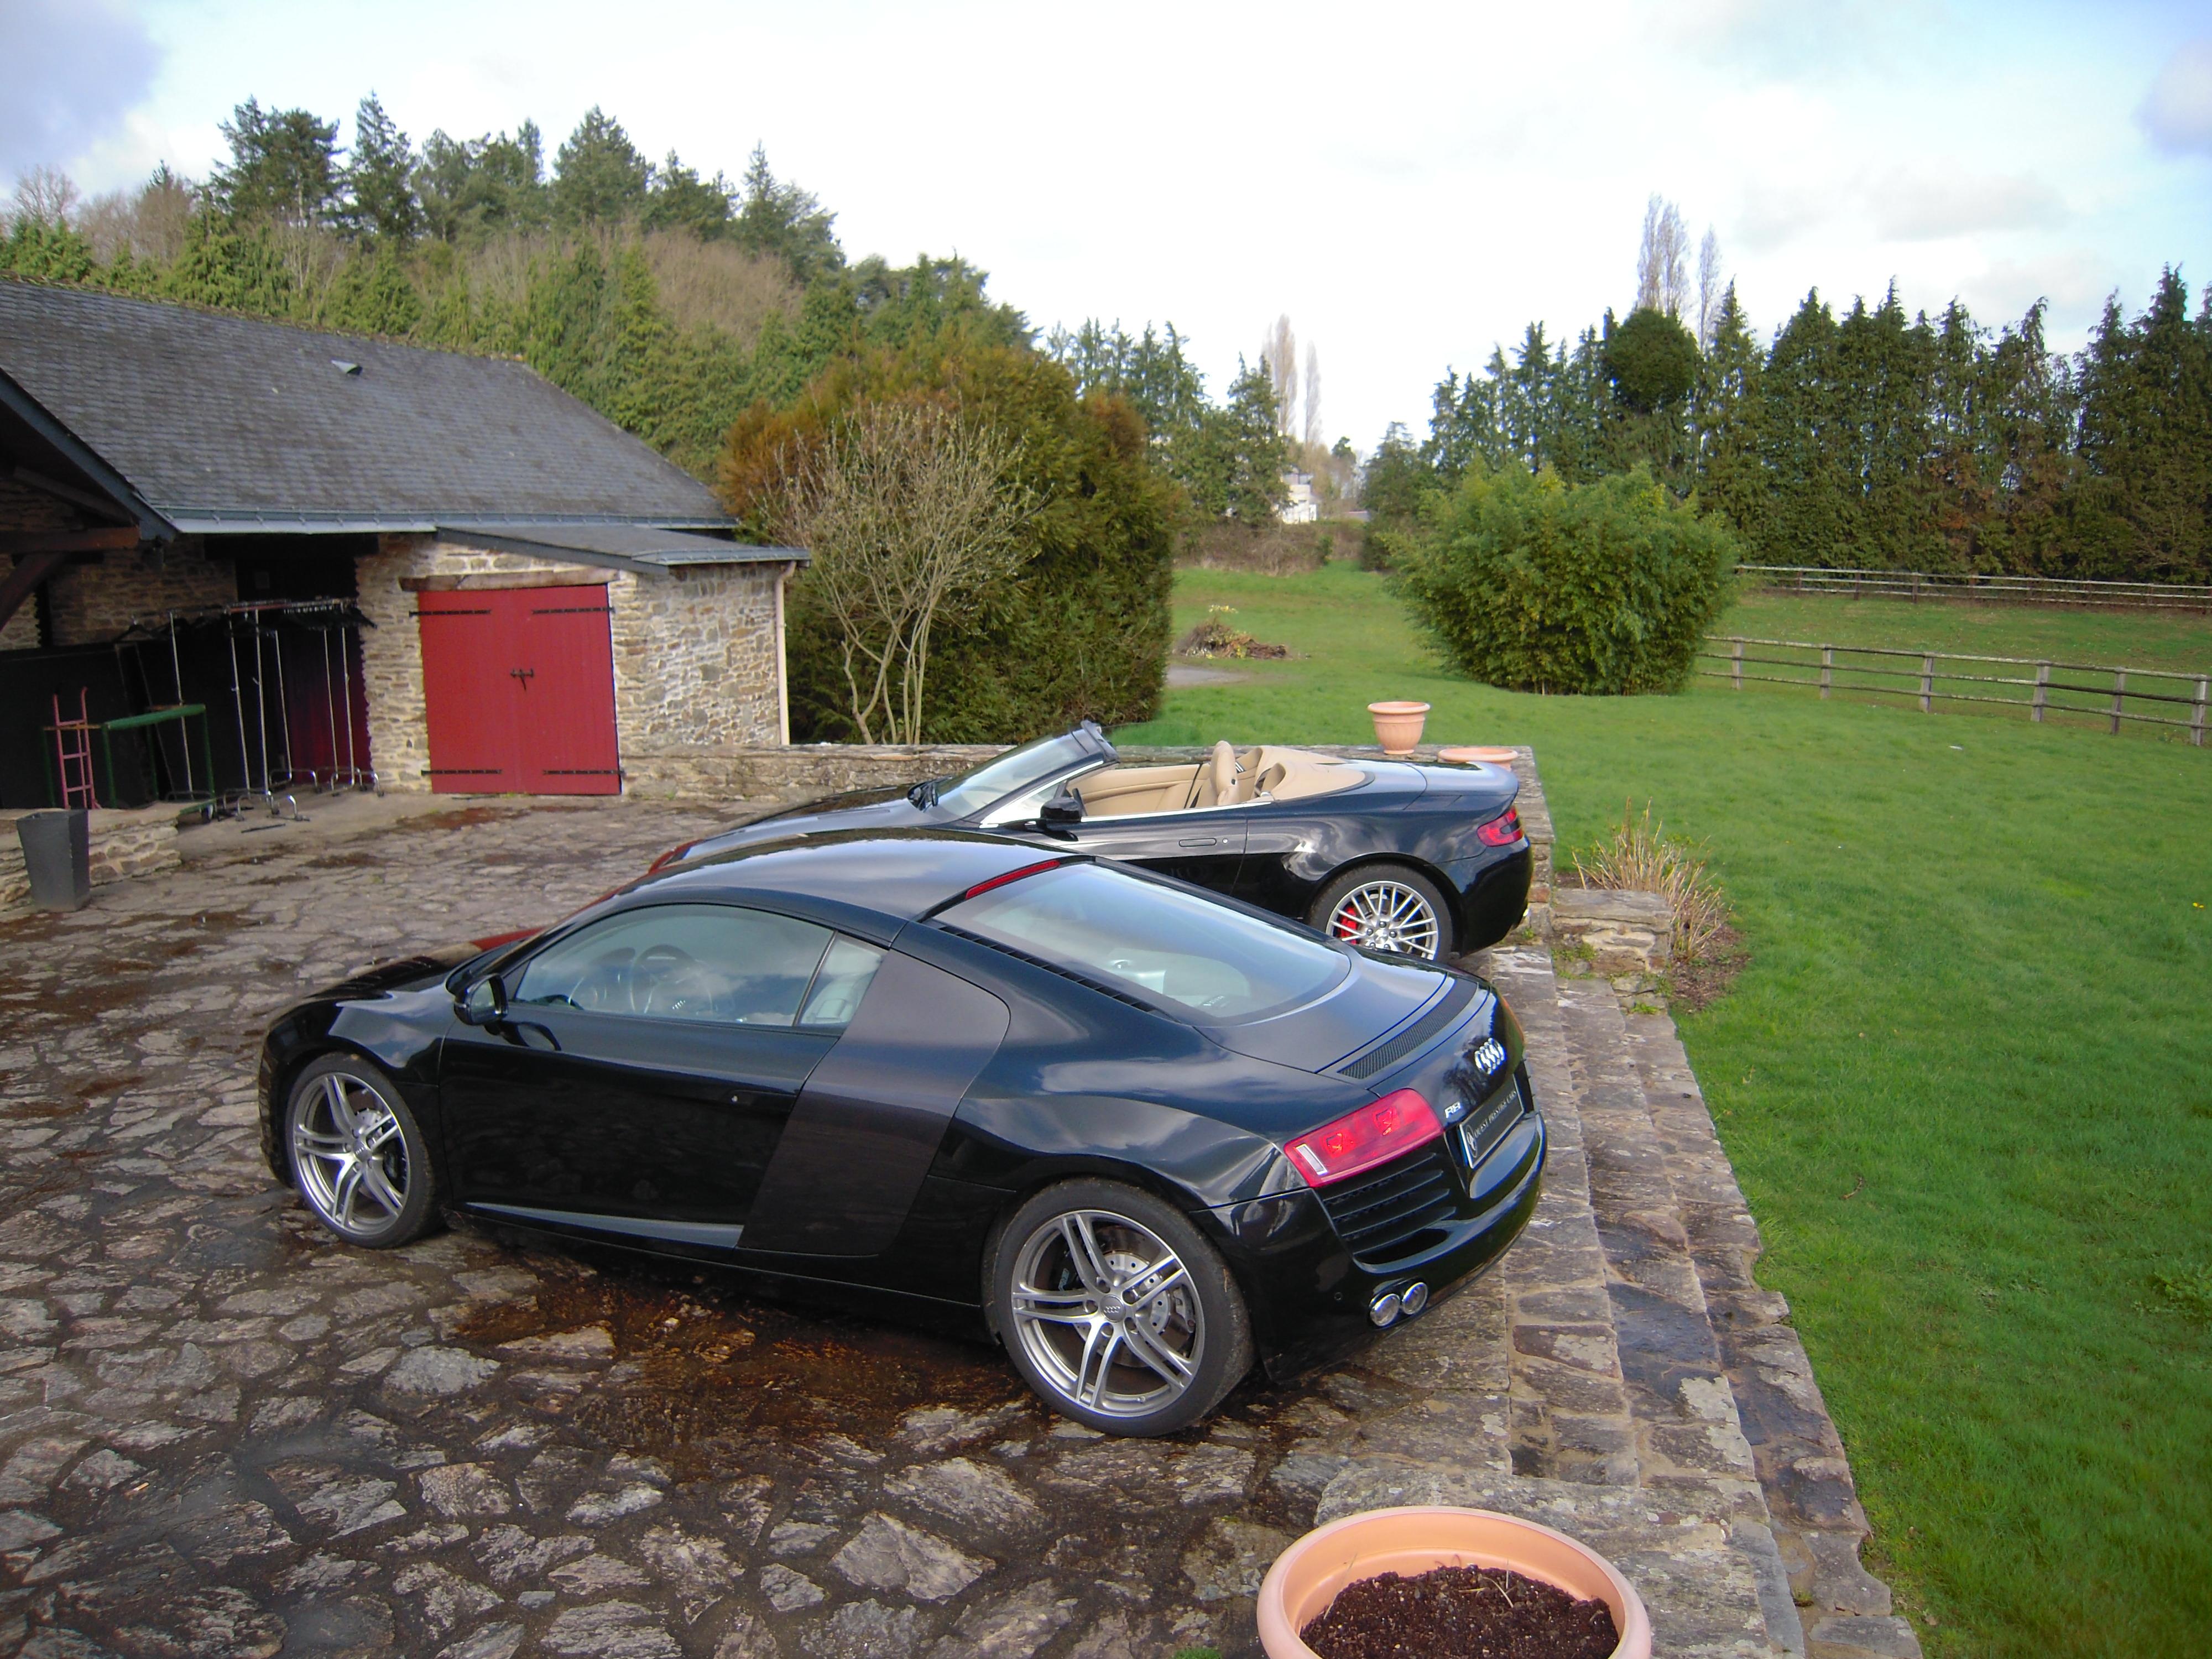 ouest prestige cars location de voiture de prestige nantes. Black Bedroom Furniture Sets. Home Design Ideas